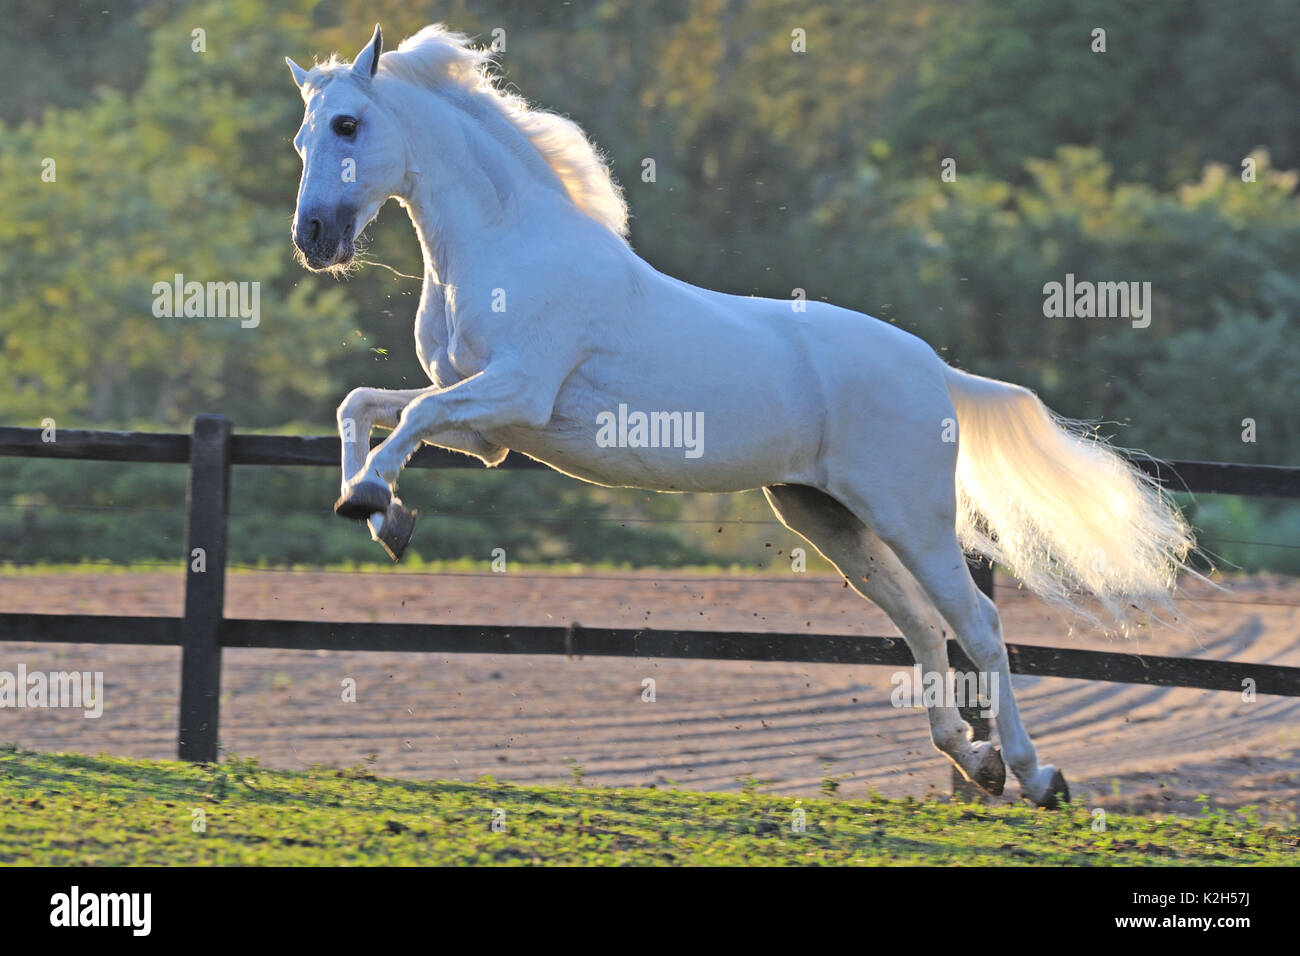 Mangalarga Marchador. Gray stallion leaping on a pasture. Germany - Stock Image